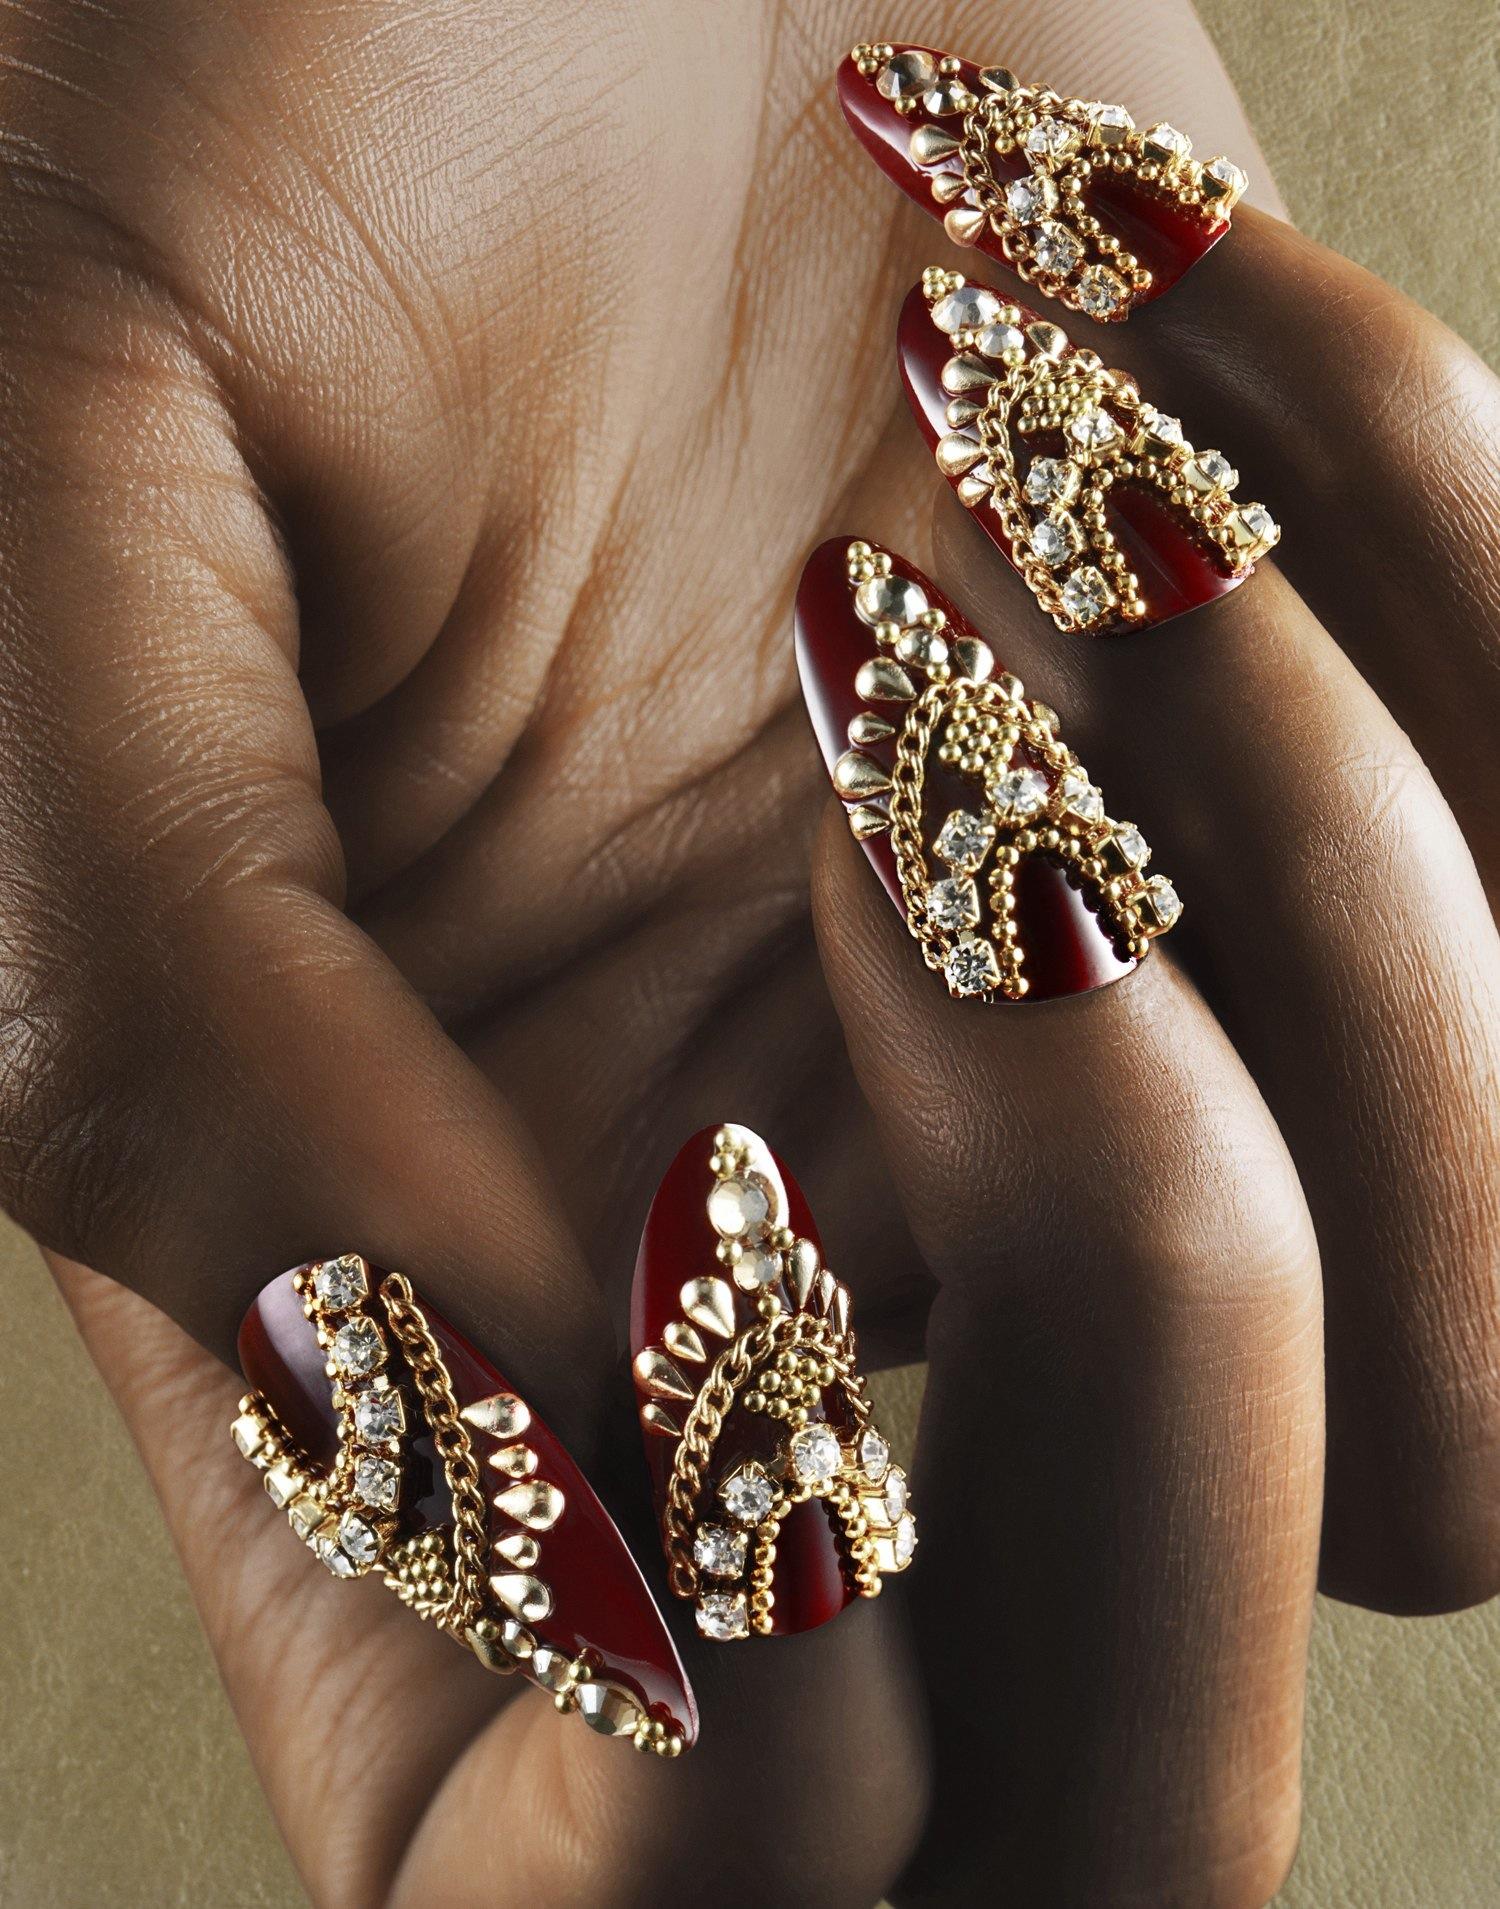 Nigel Cox photographs nail art for Essence magazine « Stockland ...